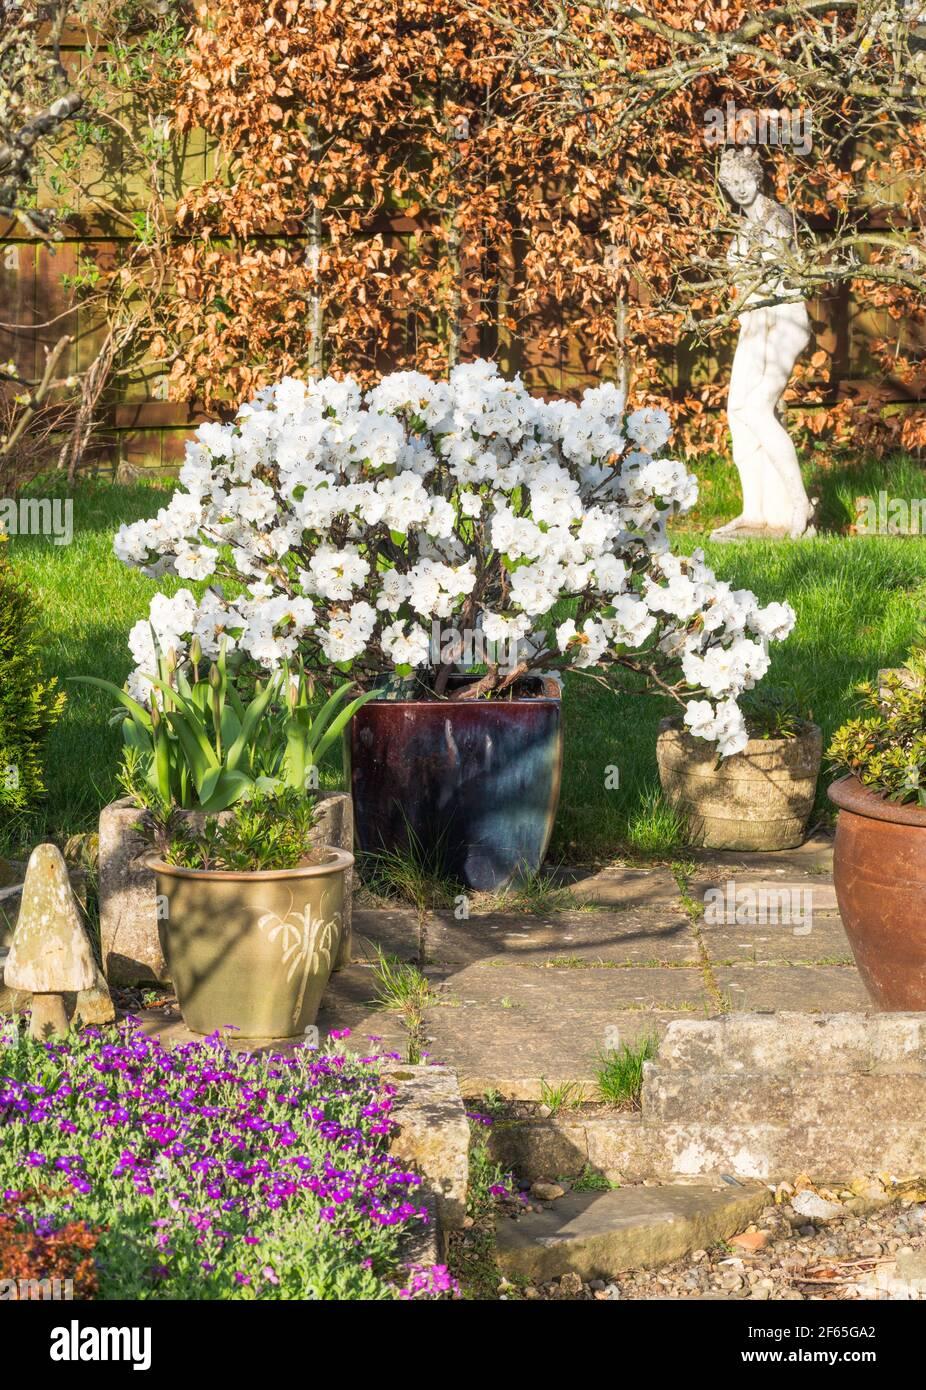 evergreen-rhododendron-shrub-snow-lady-from-cilatum-x-leucaspis-in-a-domestic-garden-england-uk-2F65GA2.jpg